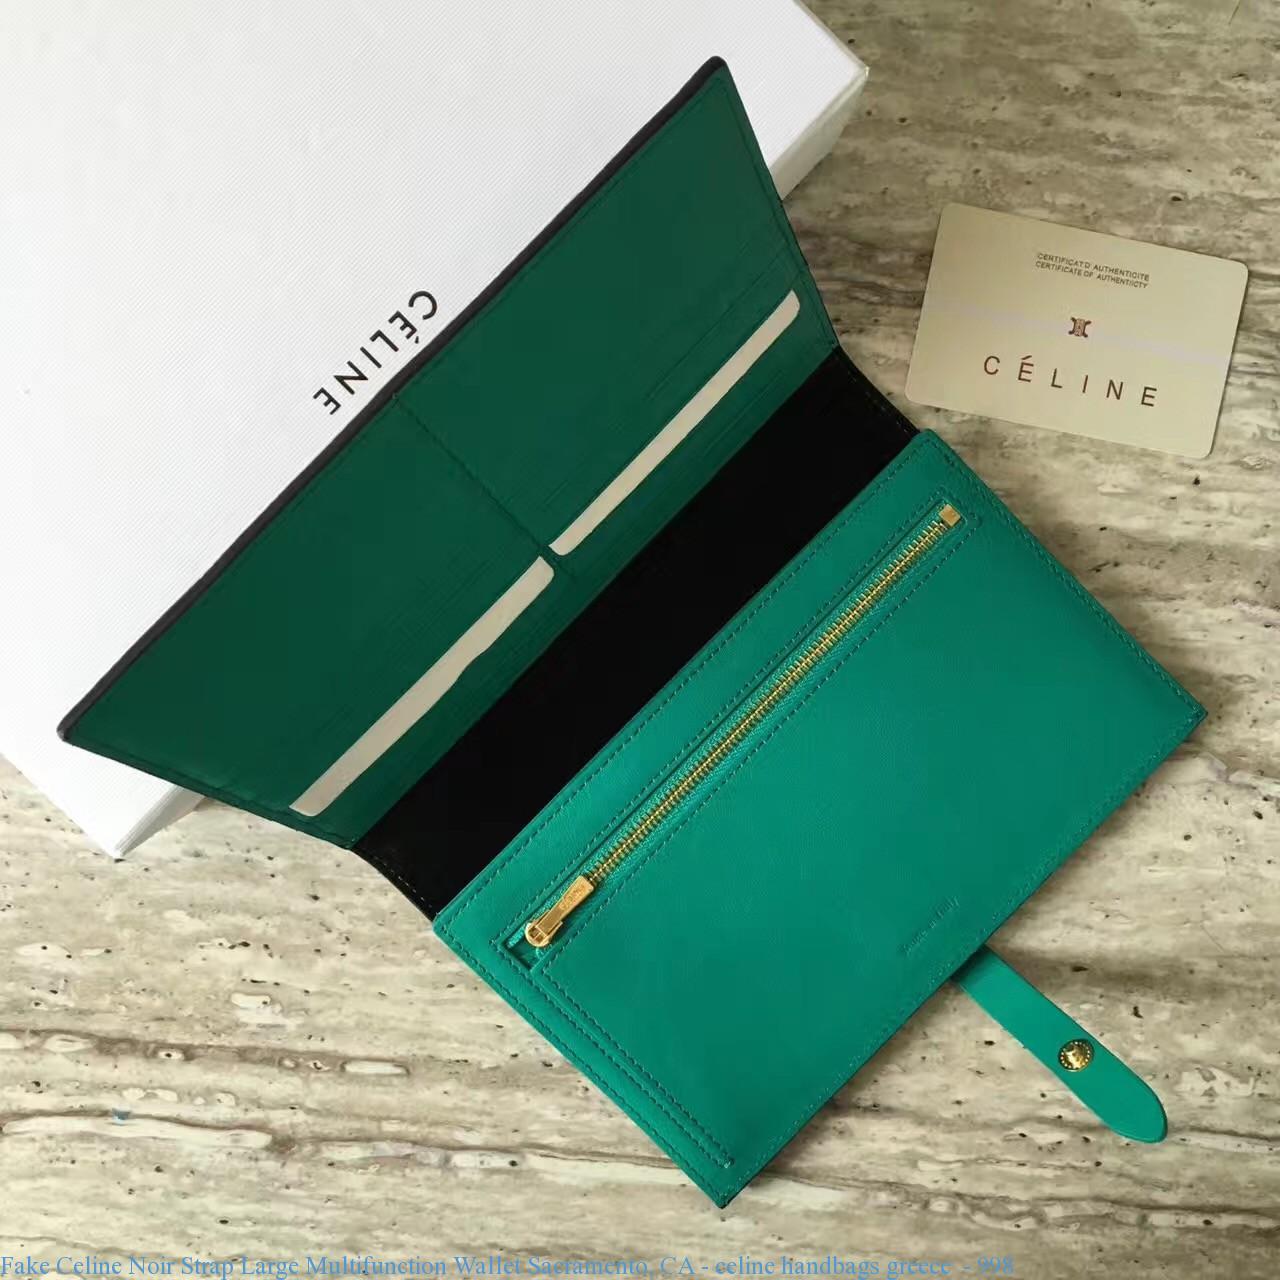 baa33a5e03d0 Fake Celine Noir Strap Large Multifunction Wallet Sacramento